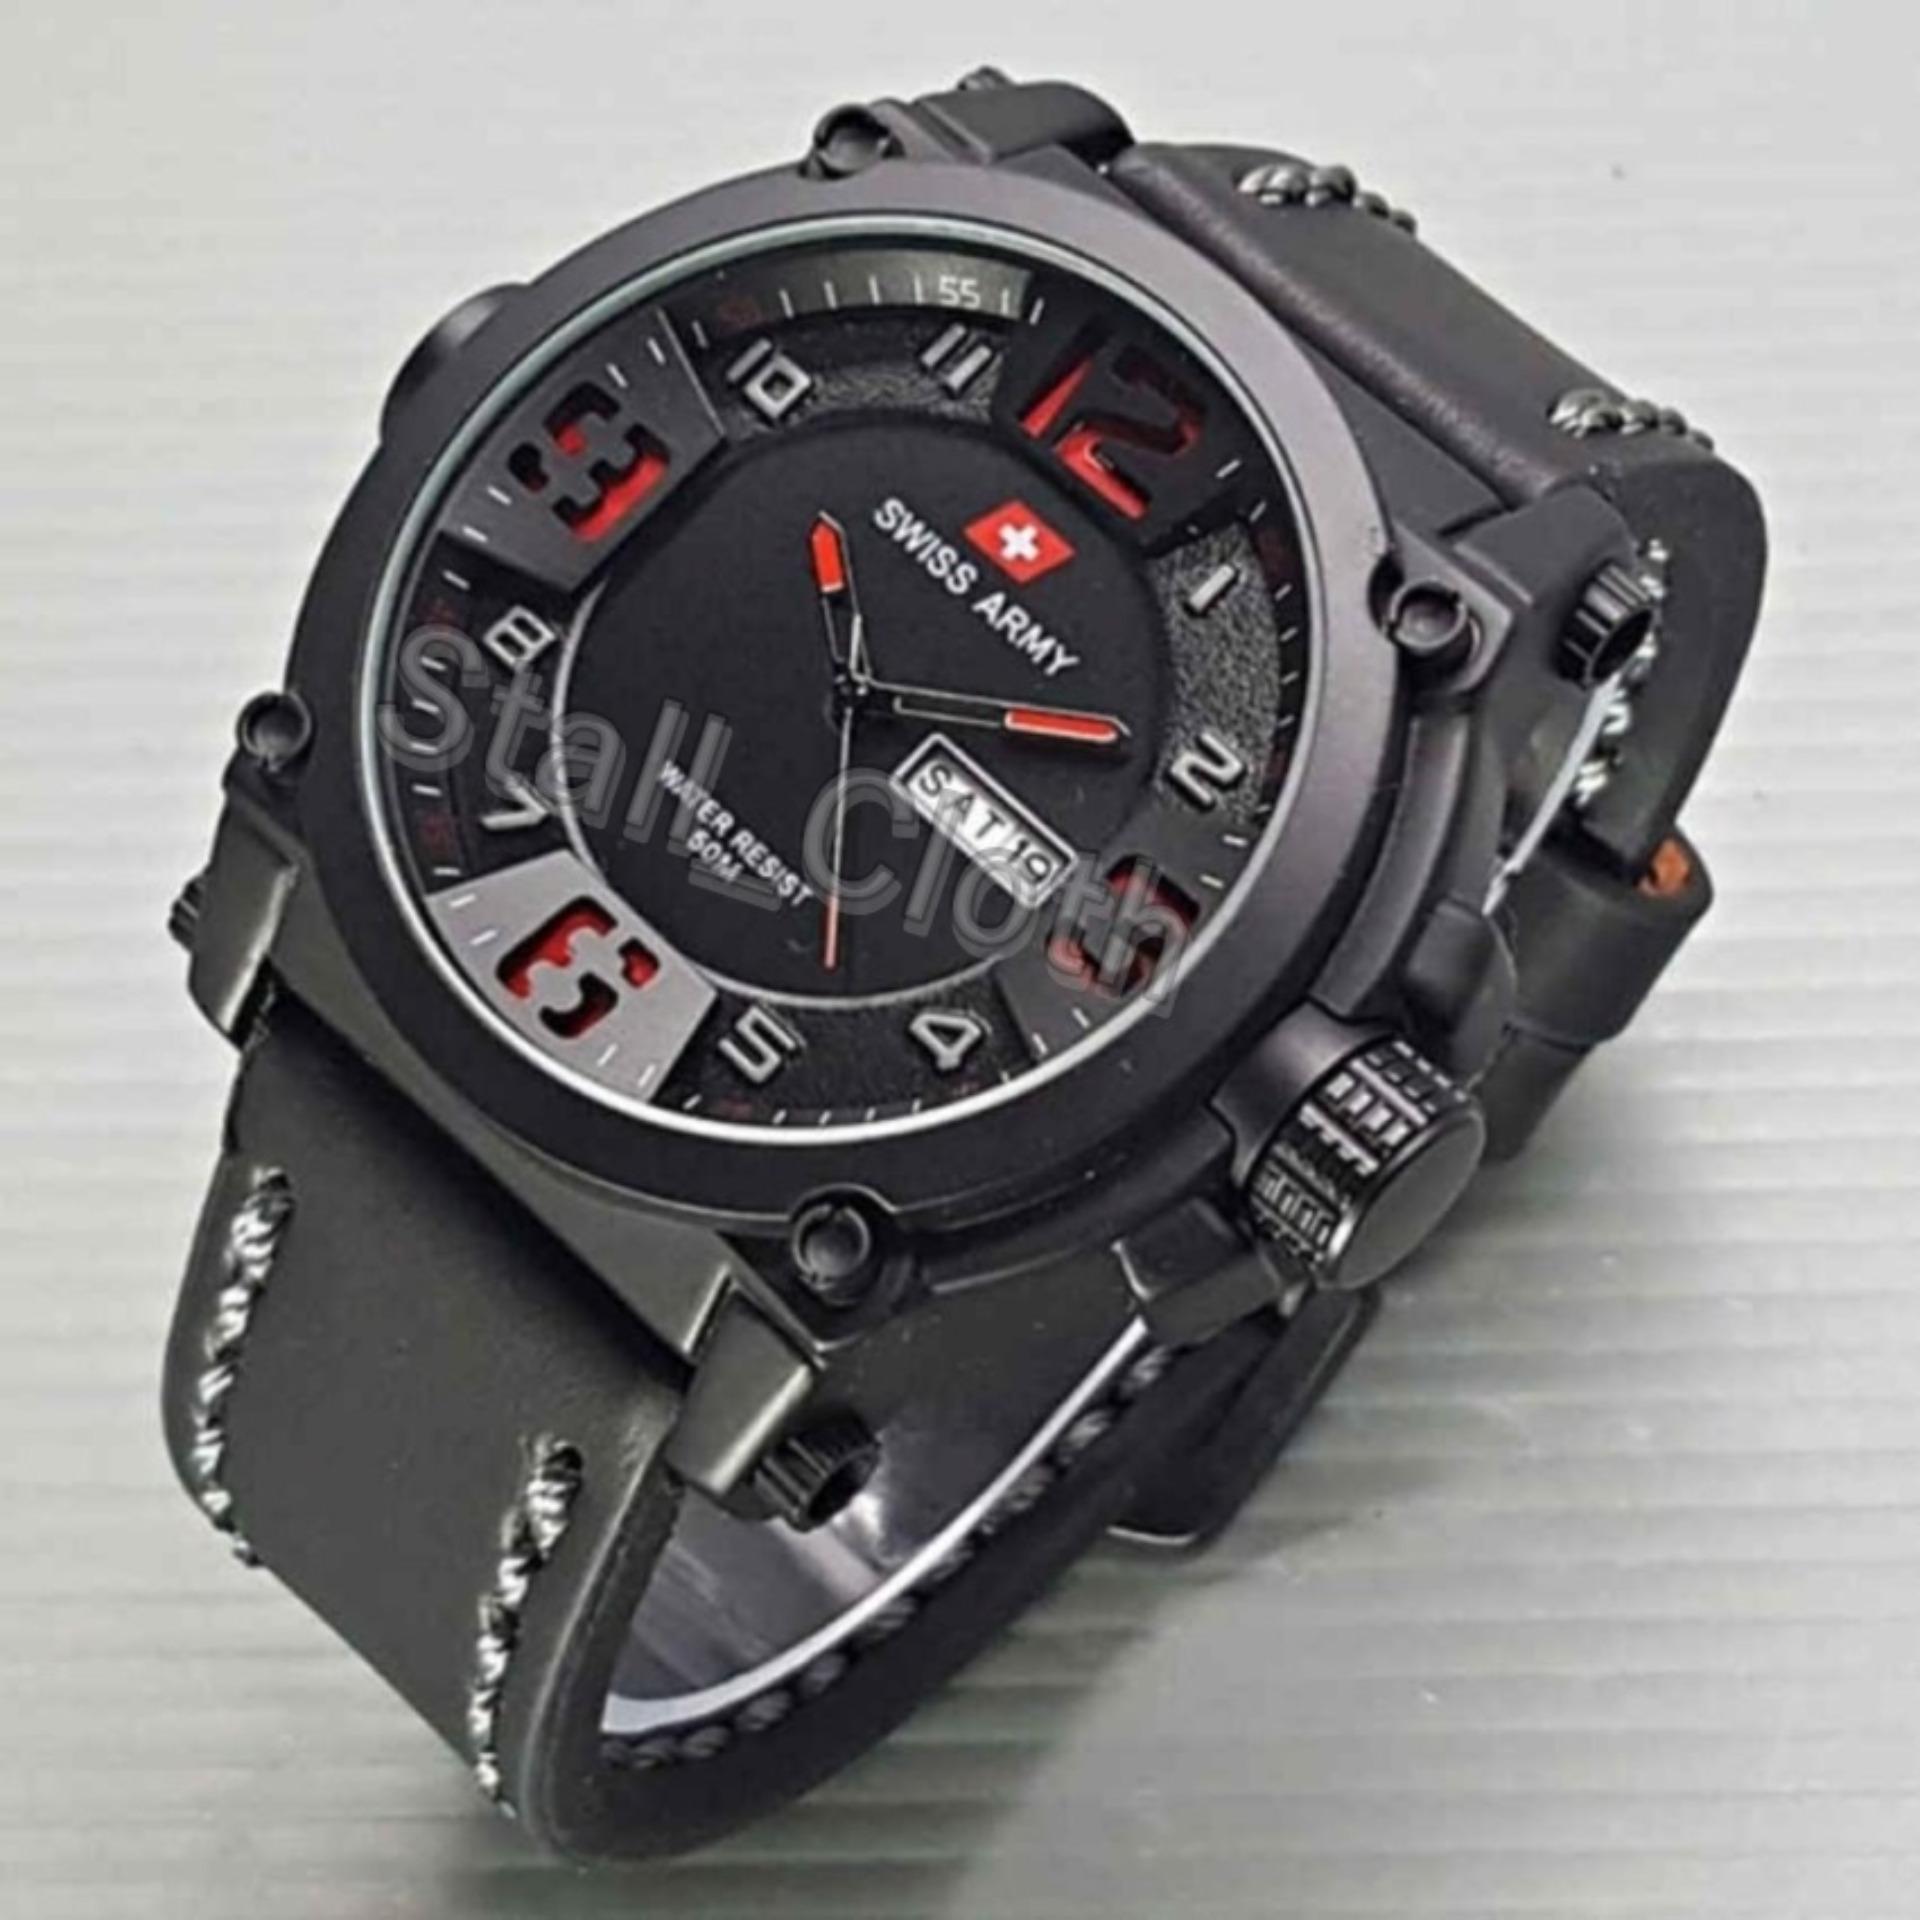 Swiss Army Watches Leather Strap Terbaru - Jam Tangan Fashion Pria Original -